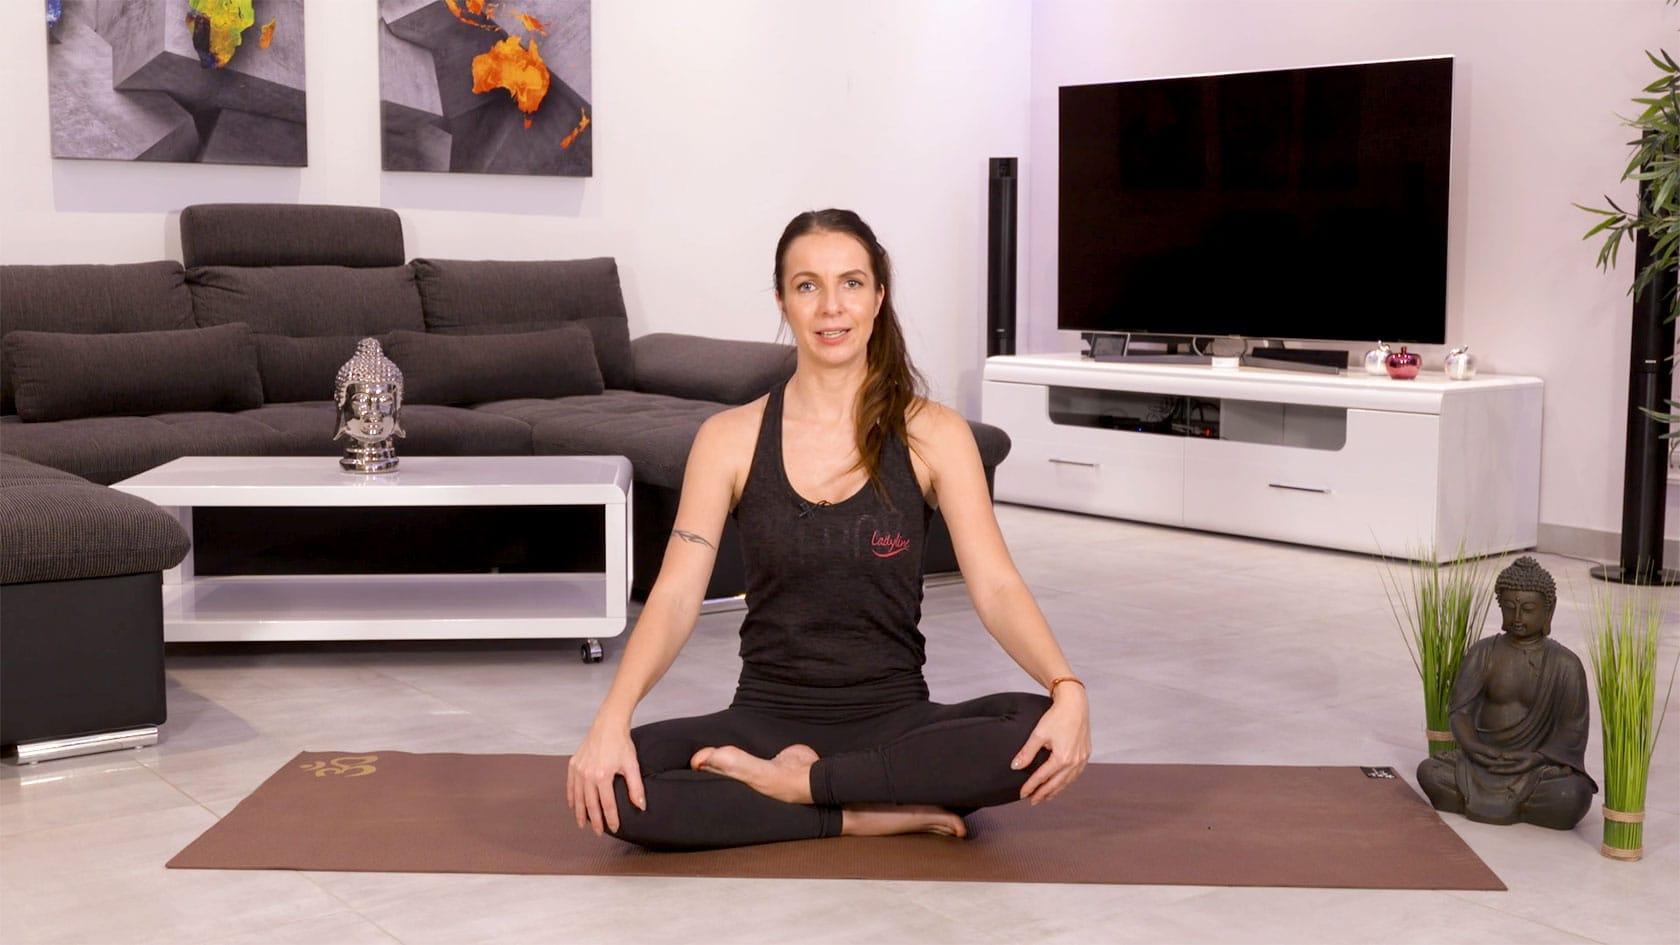 Hatha Yoga Onlinekurs - Präventionskurse Online